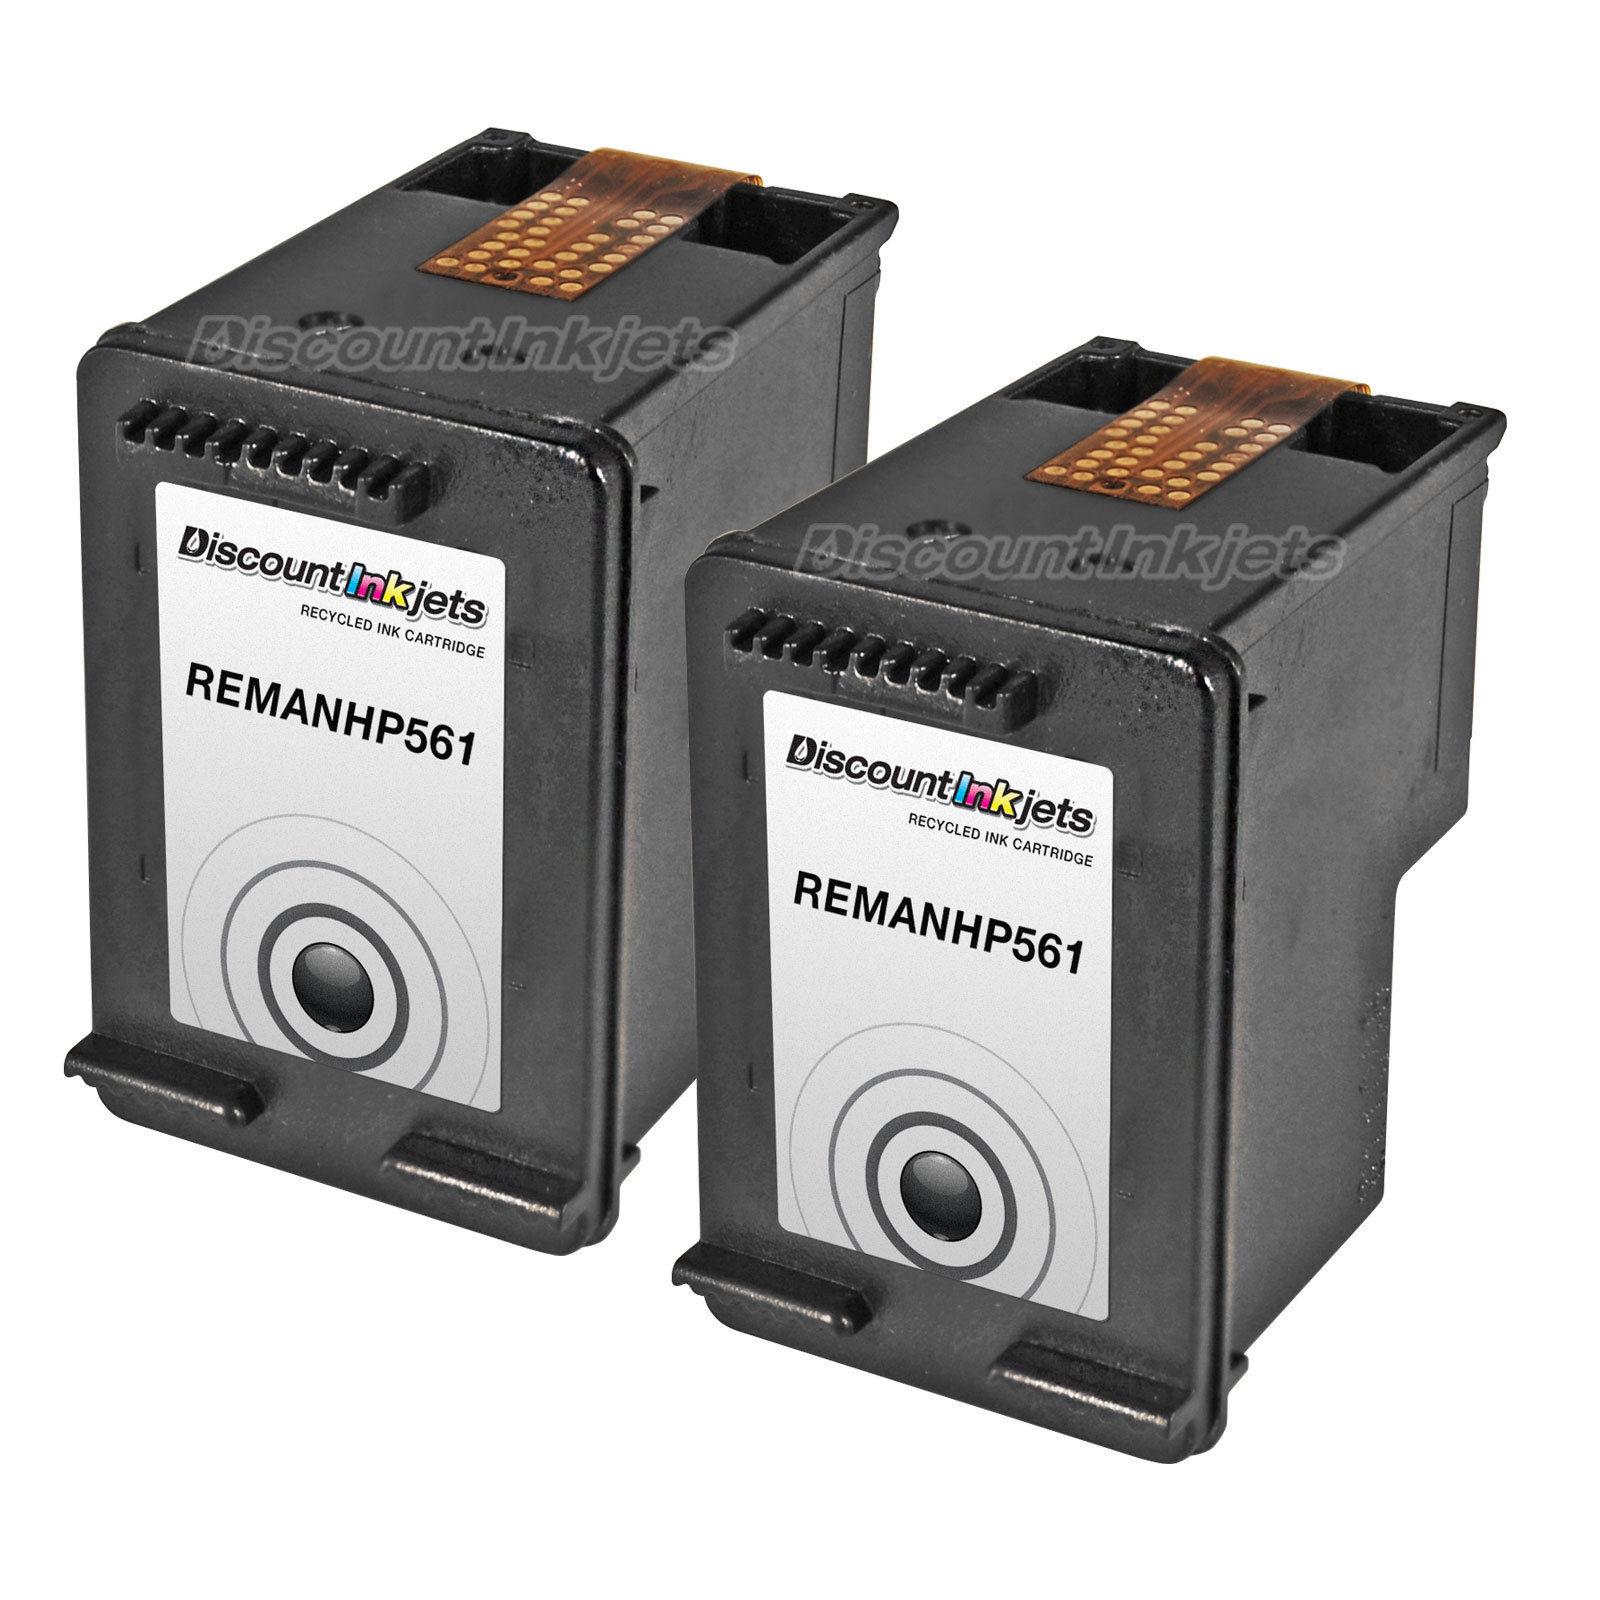 2 Ch561wn Black Printer Ink Cartridge For Hp 61 61 Deskjet